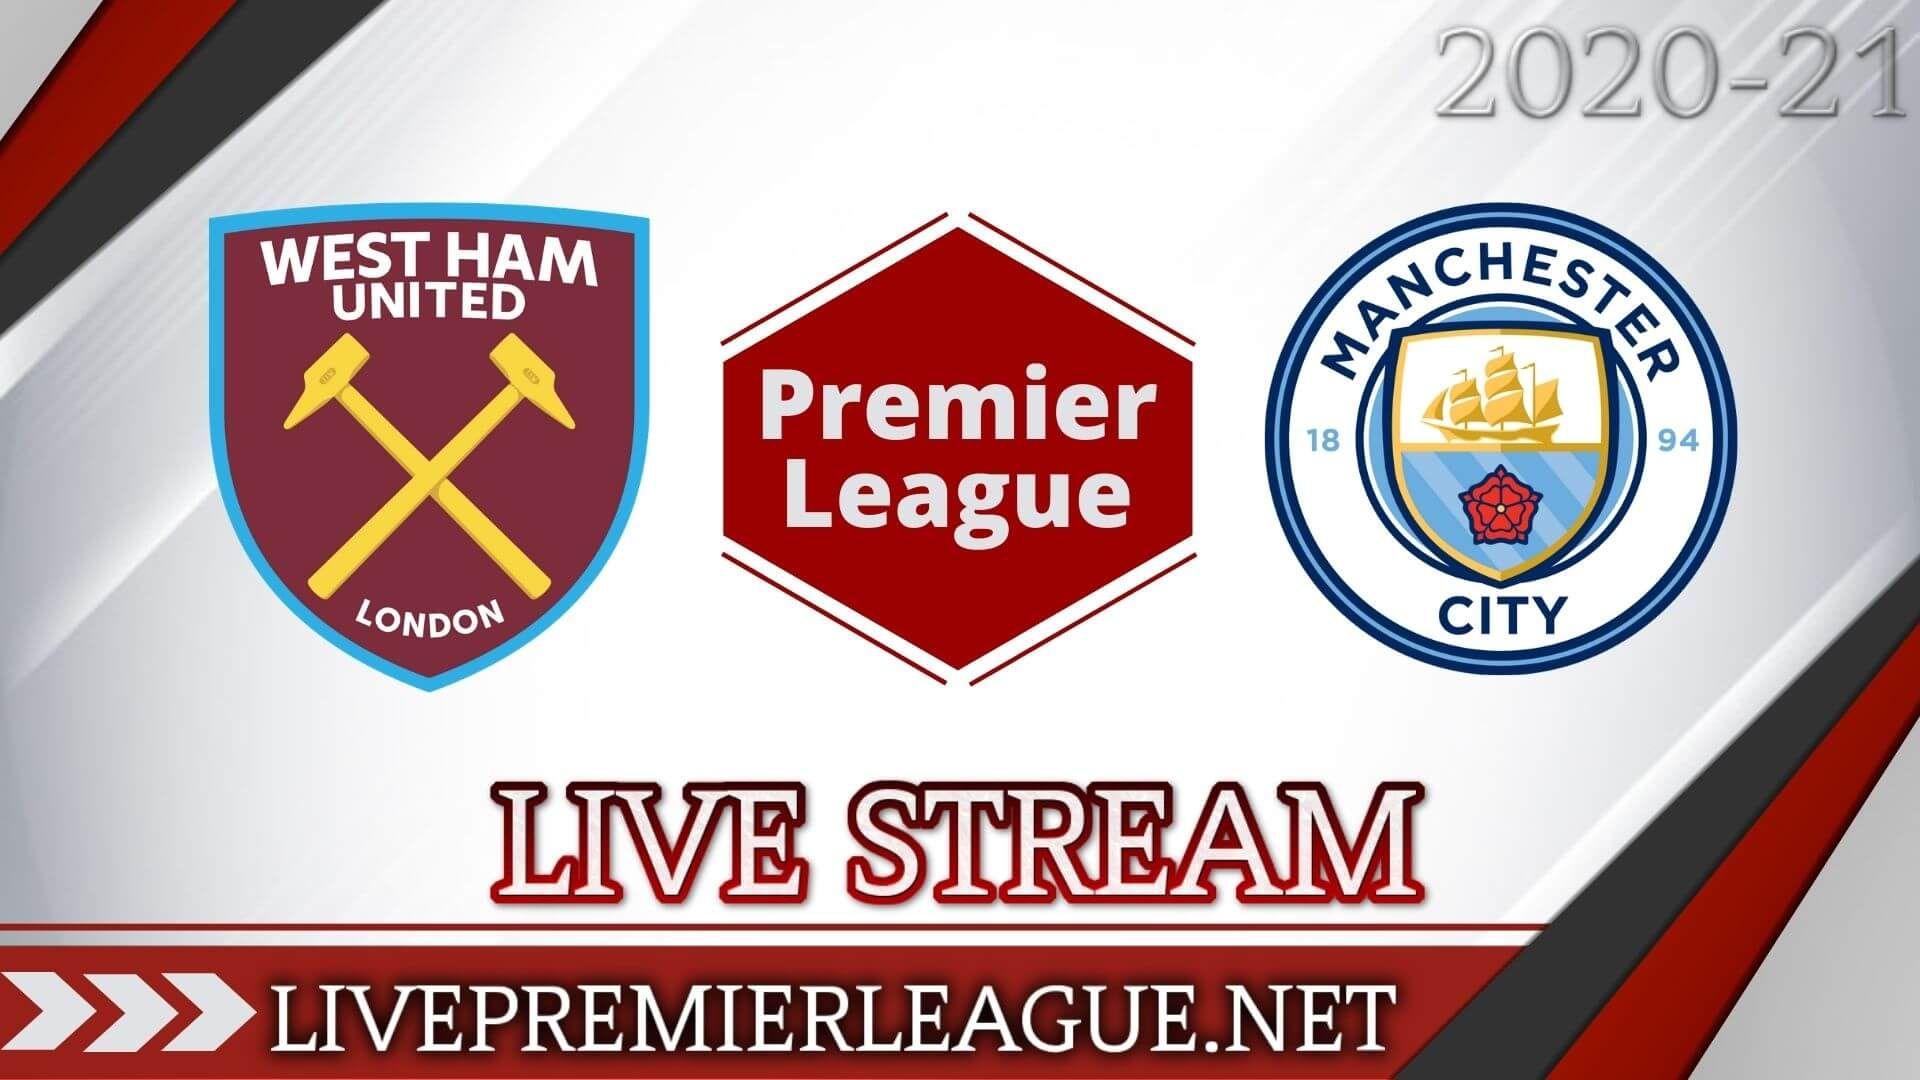 West Ham United Vs Manchester City Live Stream 2020 Week 6 Manchester City West Ham United London City